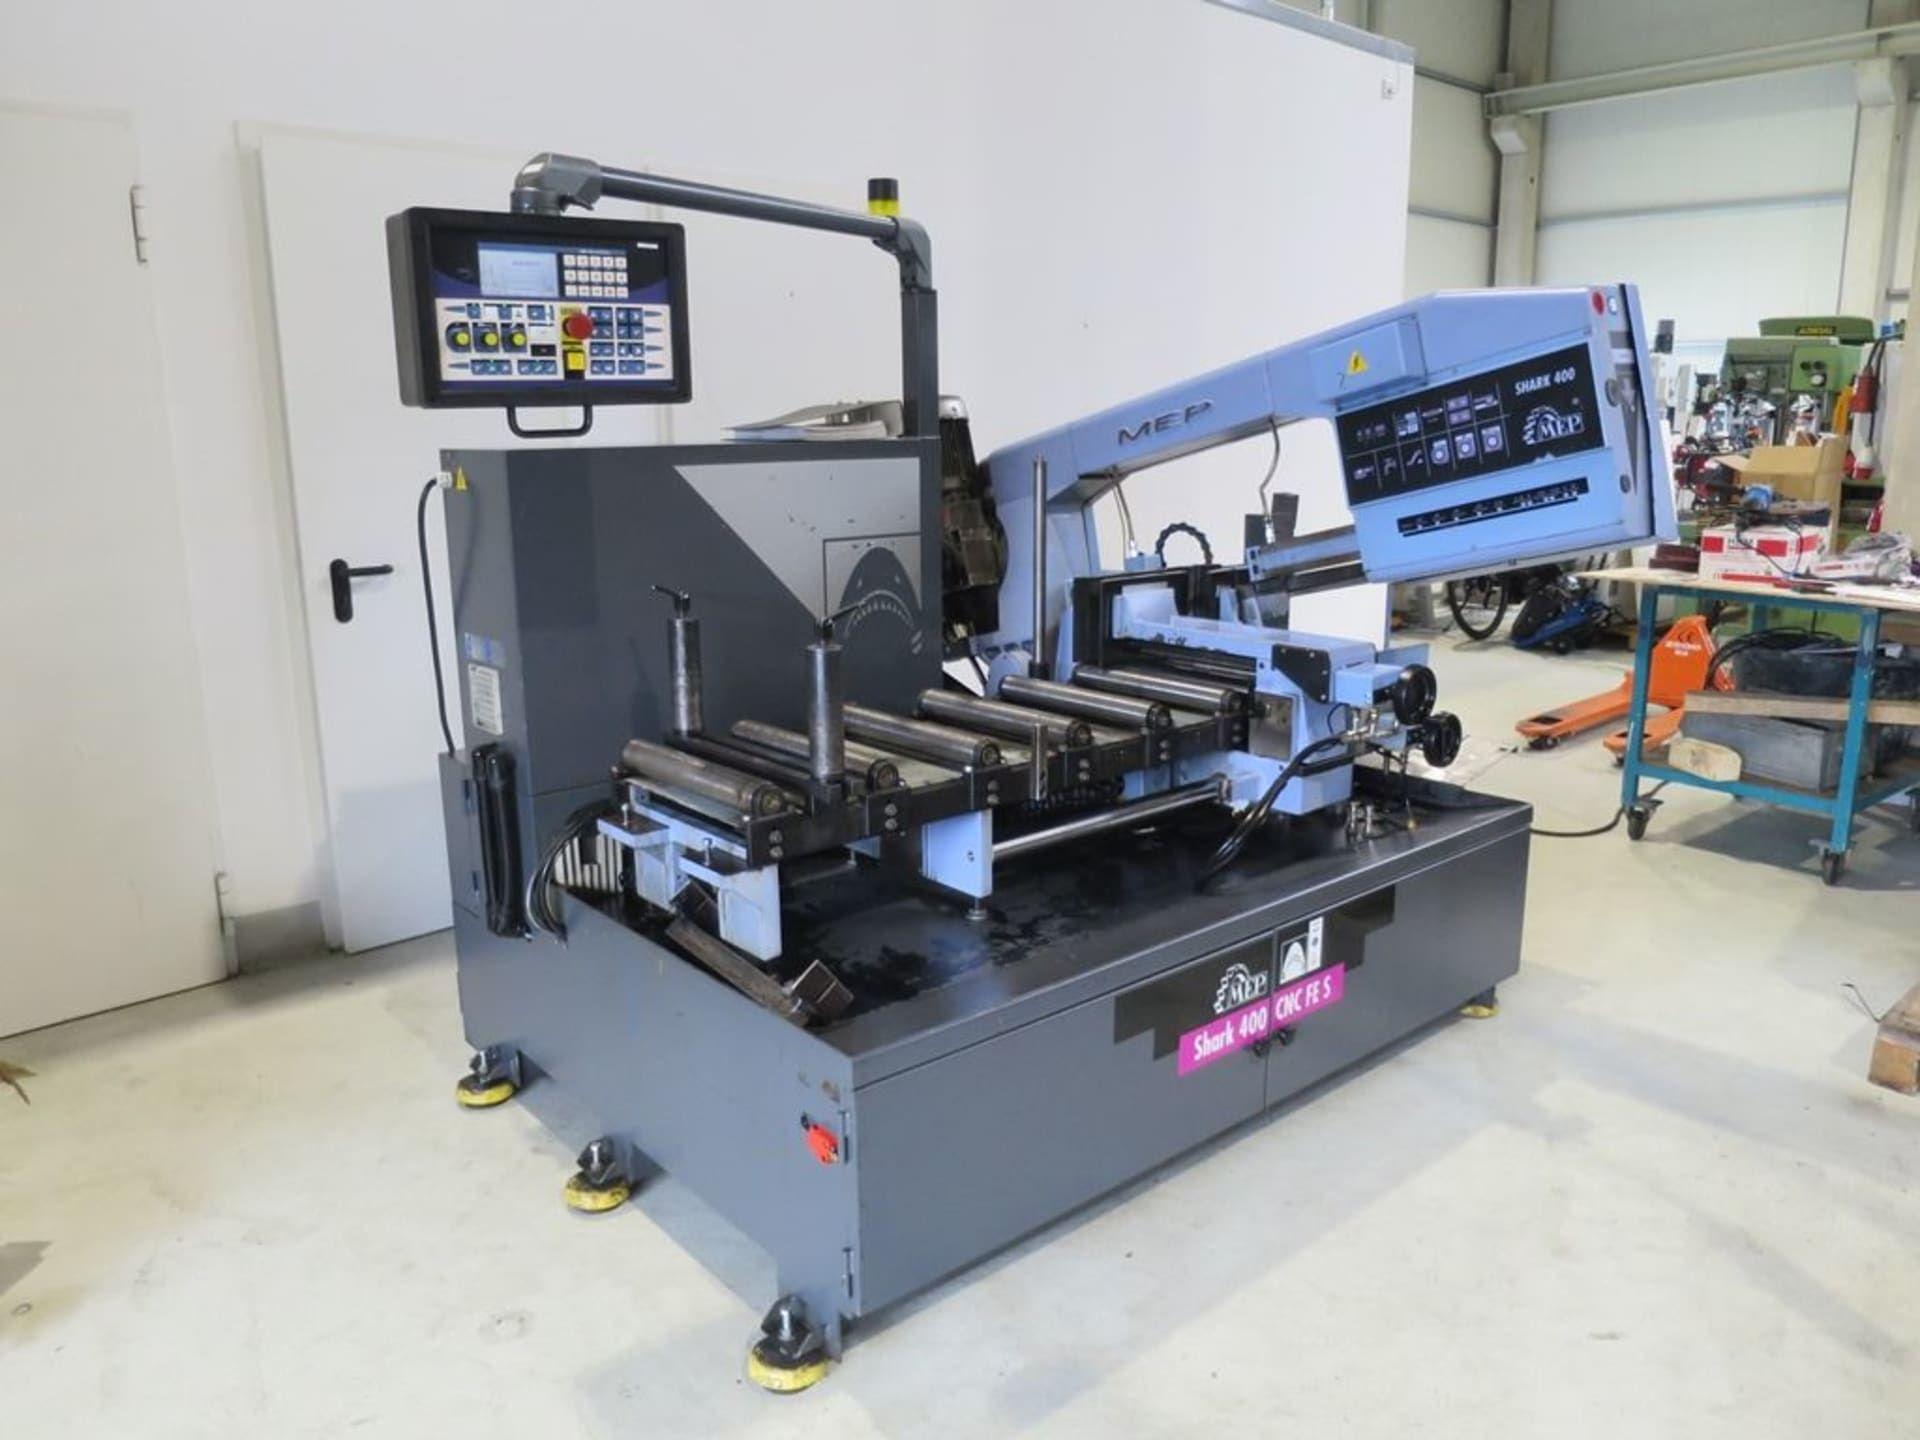 MEP Shark 400 CNC FE CNC Bandsägeautomat